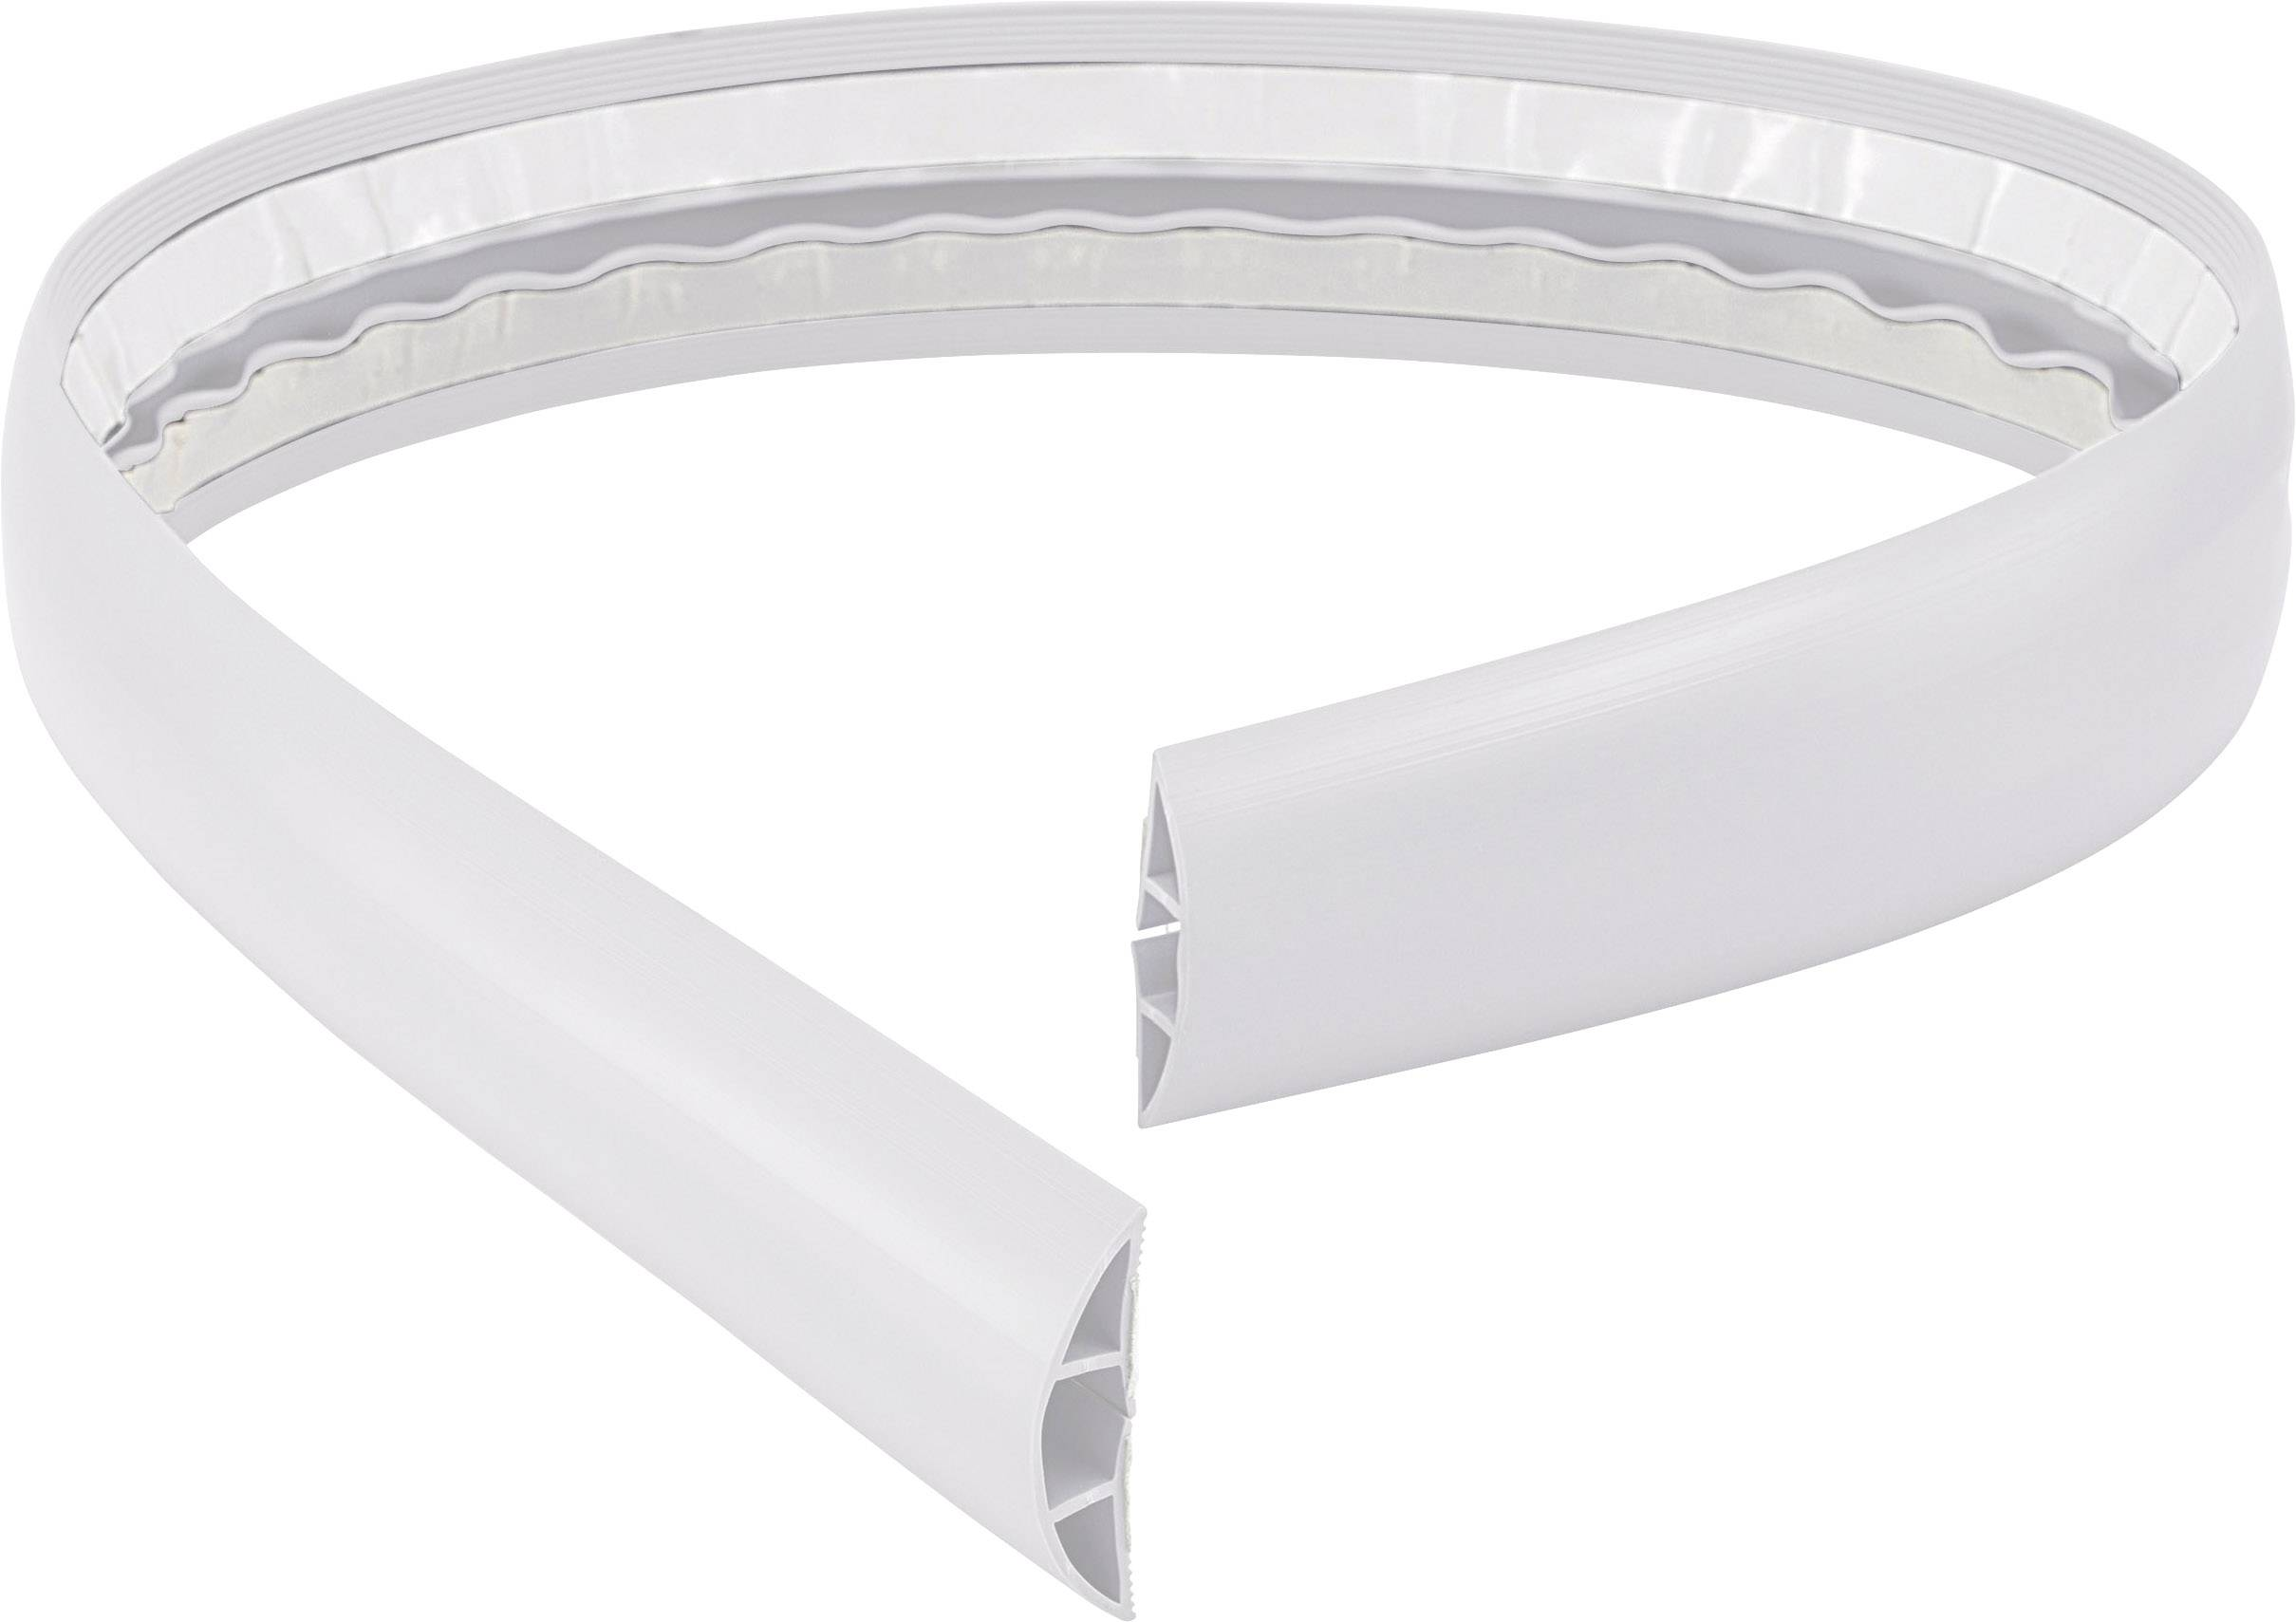 Káblový mostík Conrad Components 1226934 (d x š) 1800 mm x 50.8 mm, biela, 1 ks